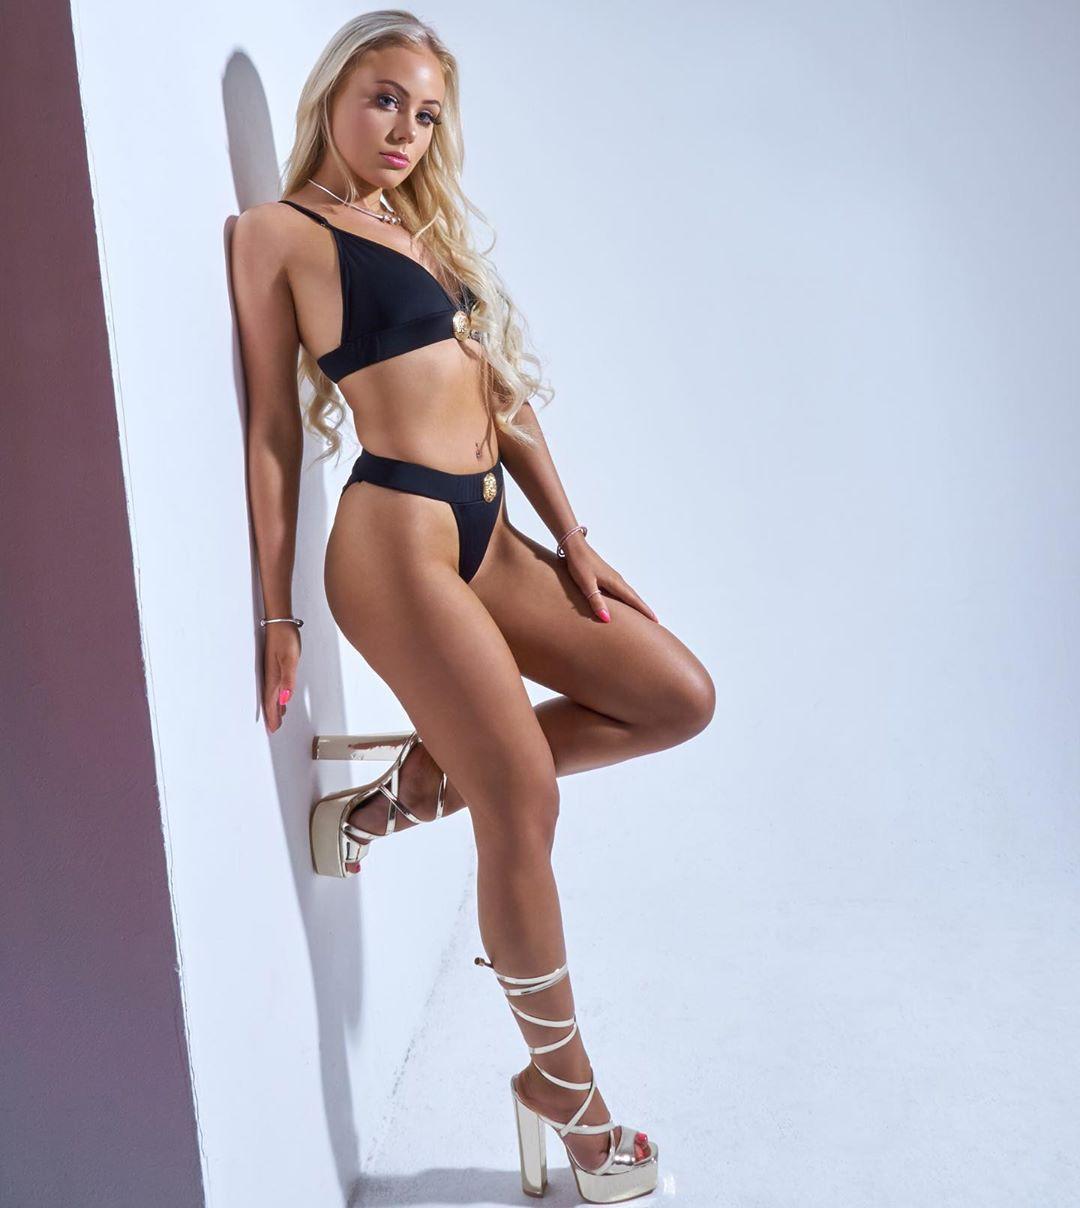 Gina Ogden lingerie, bikini outfits for girls, hot legs